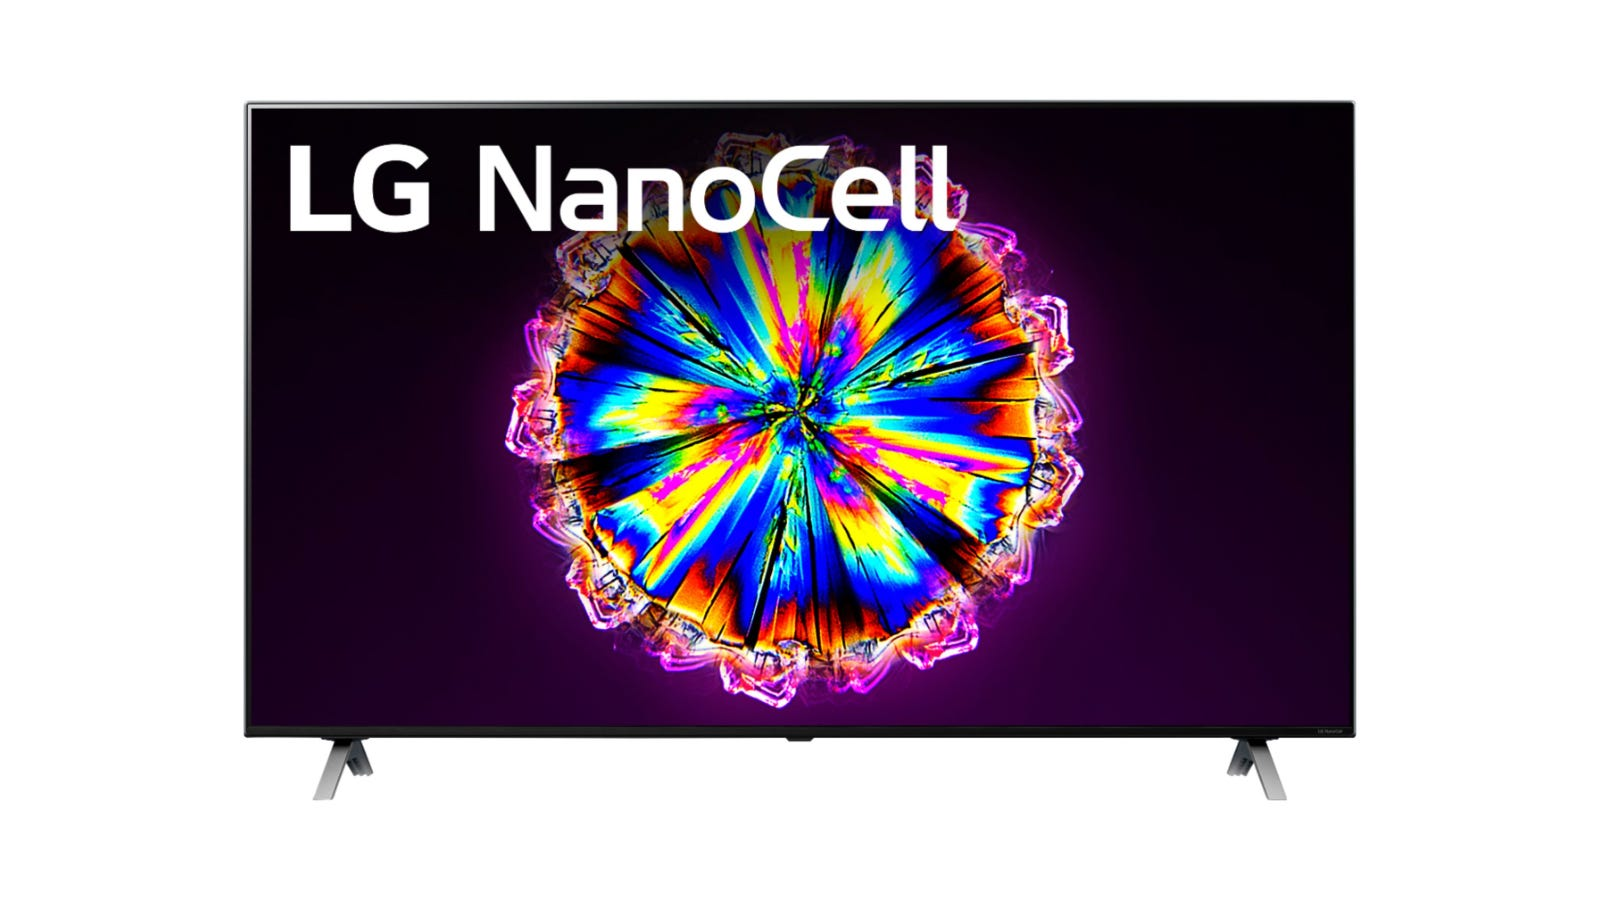 LG 90 Series TV